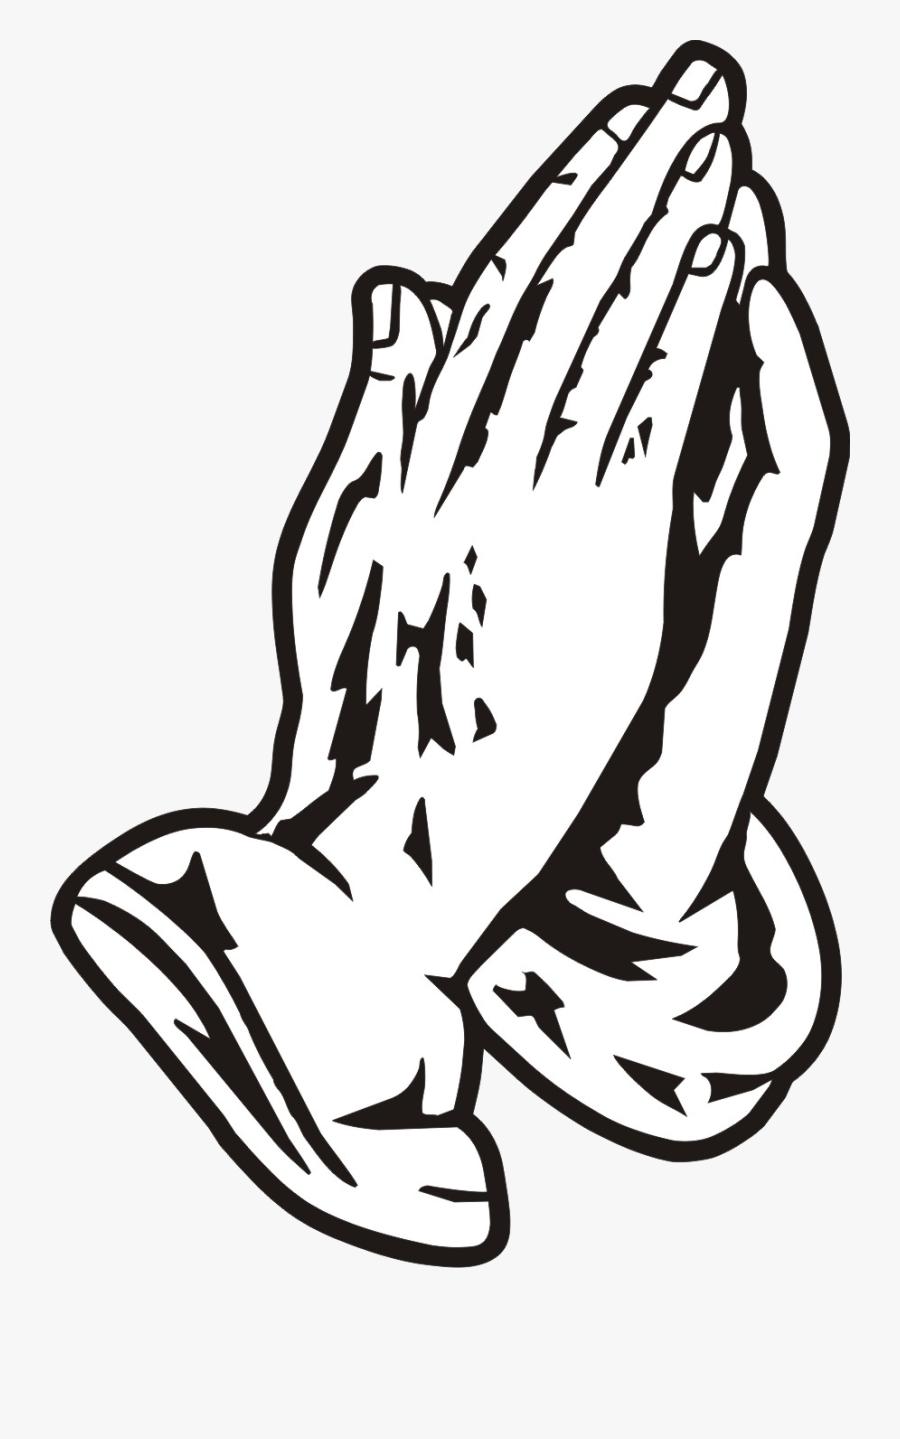 Praying Hands Hand Prayer Clipart Image Transparent - Prayer Hands Vector Png, Transparent Clipart